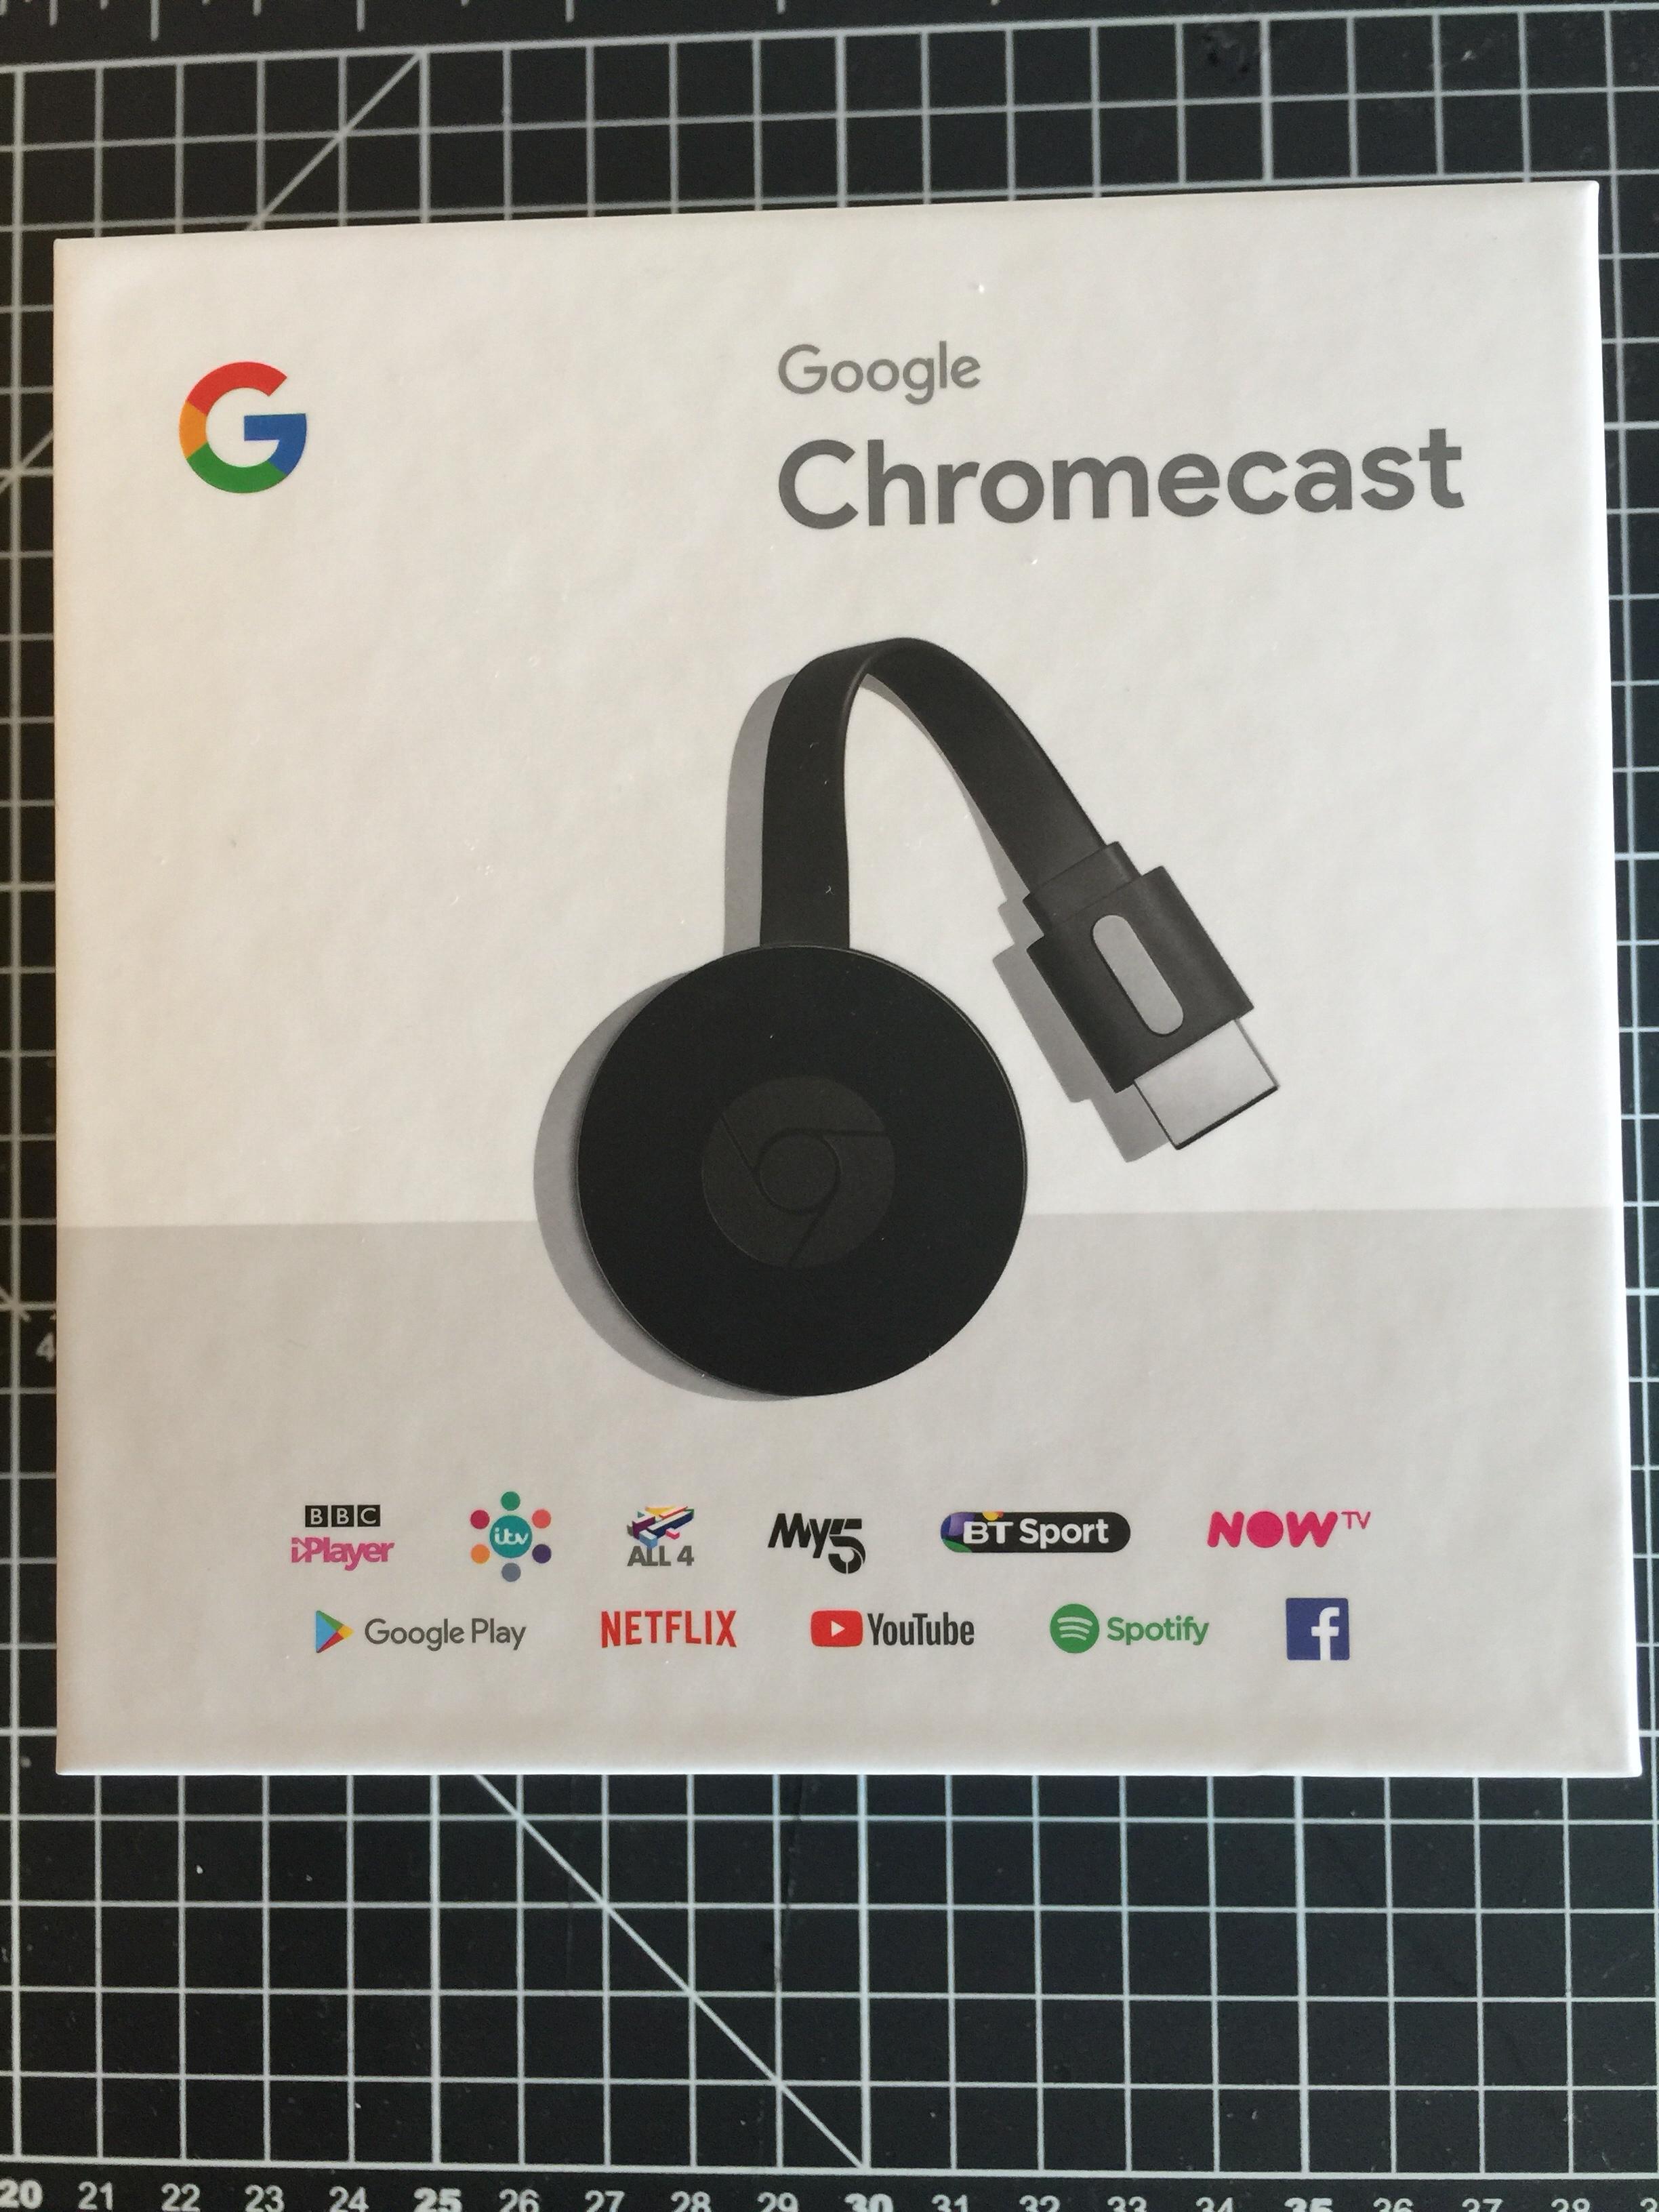 Chomecast